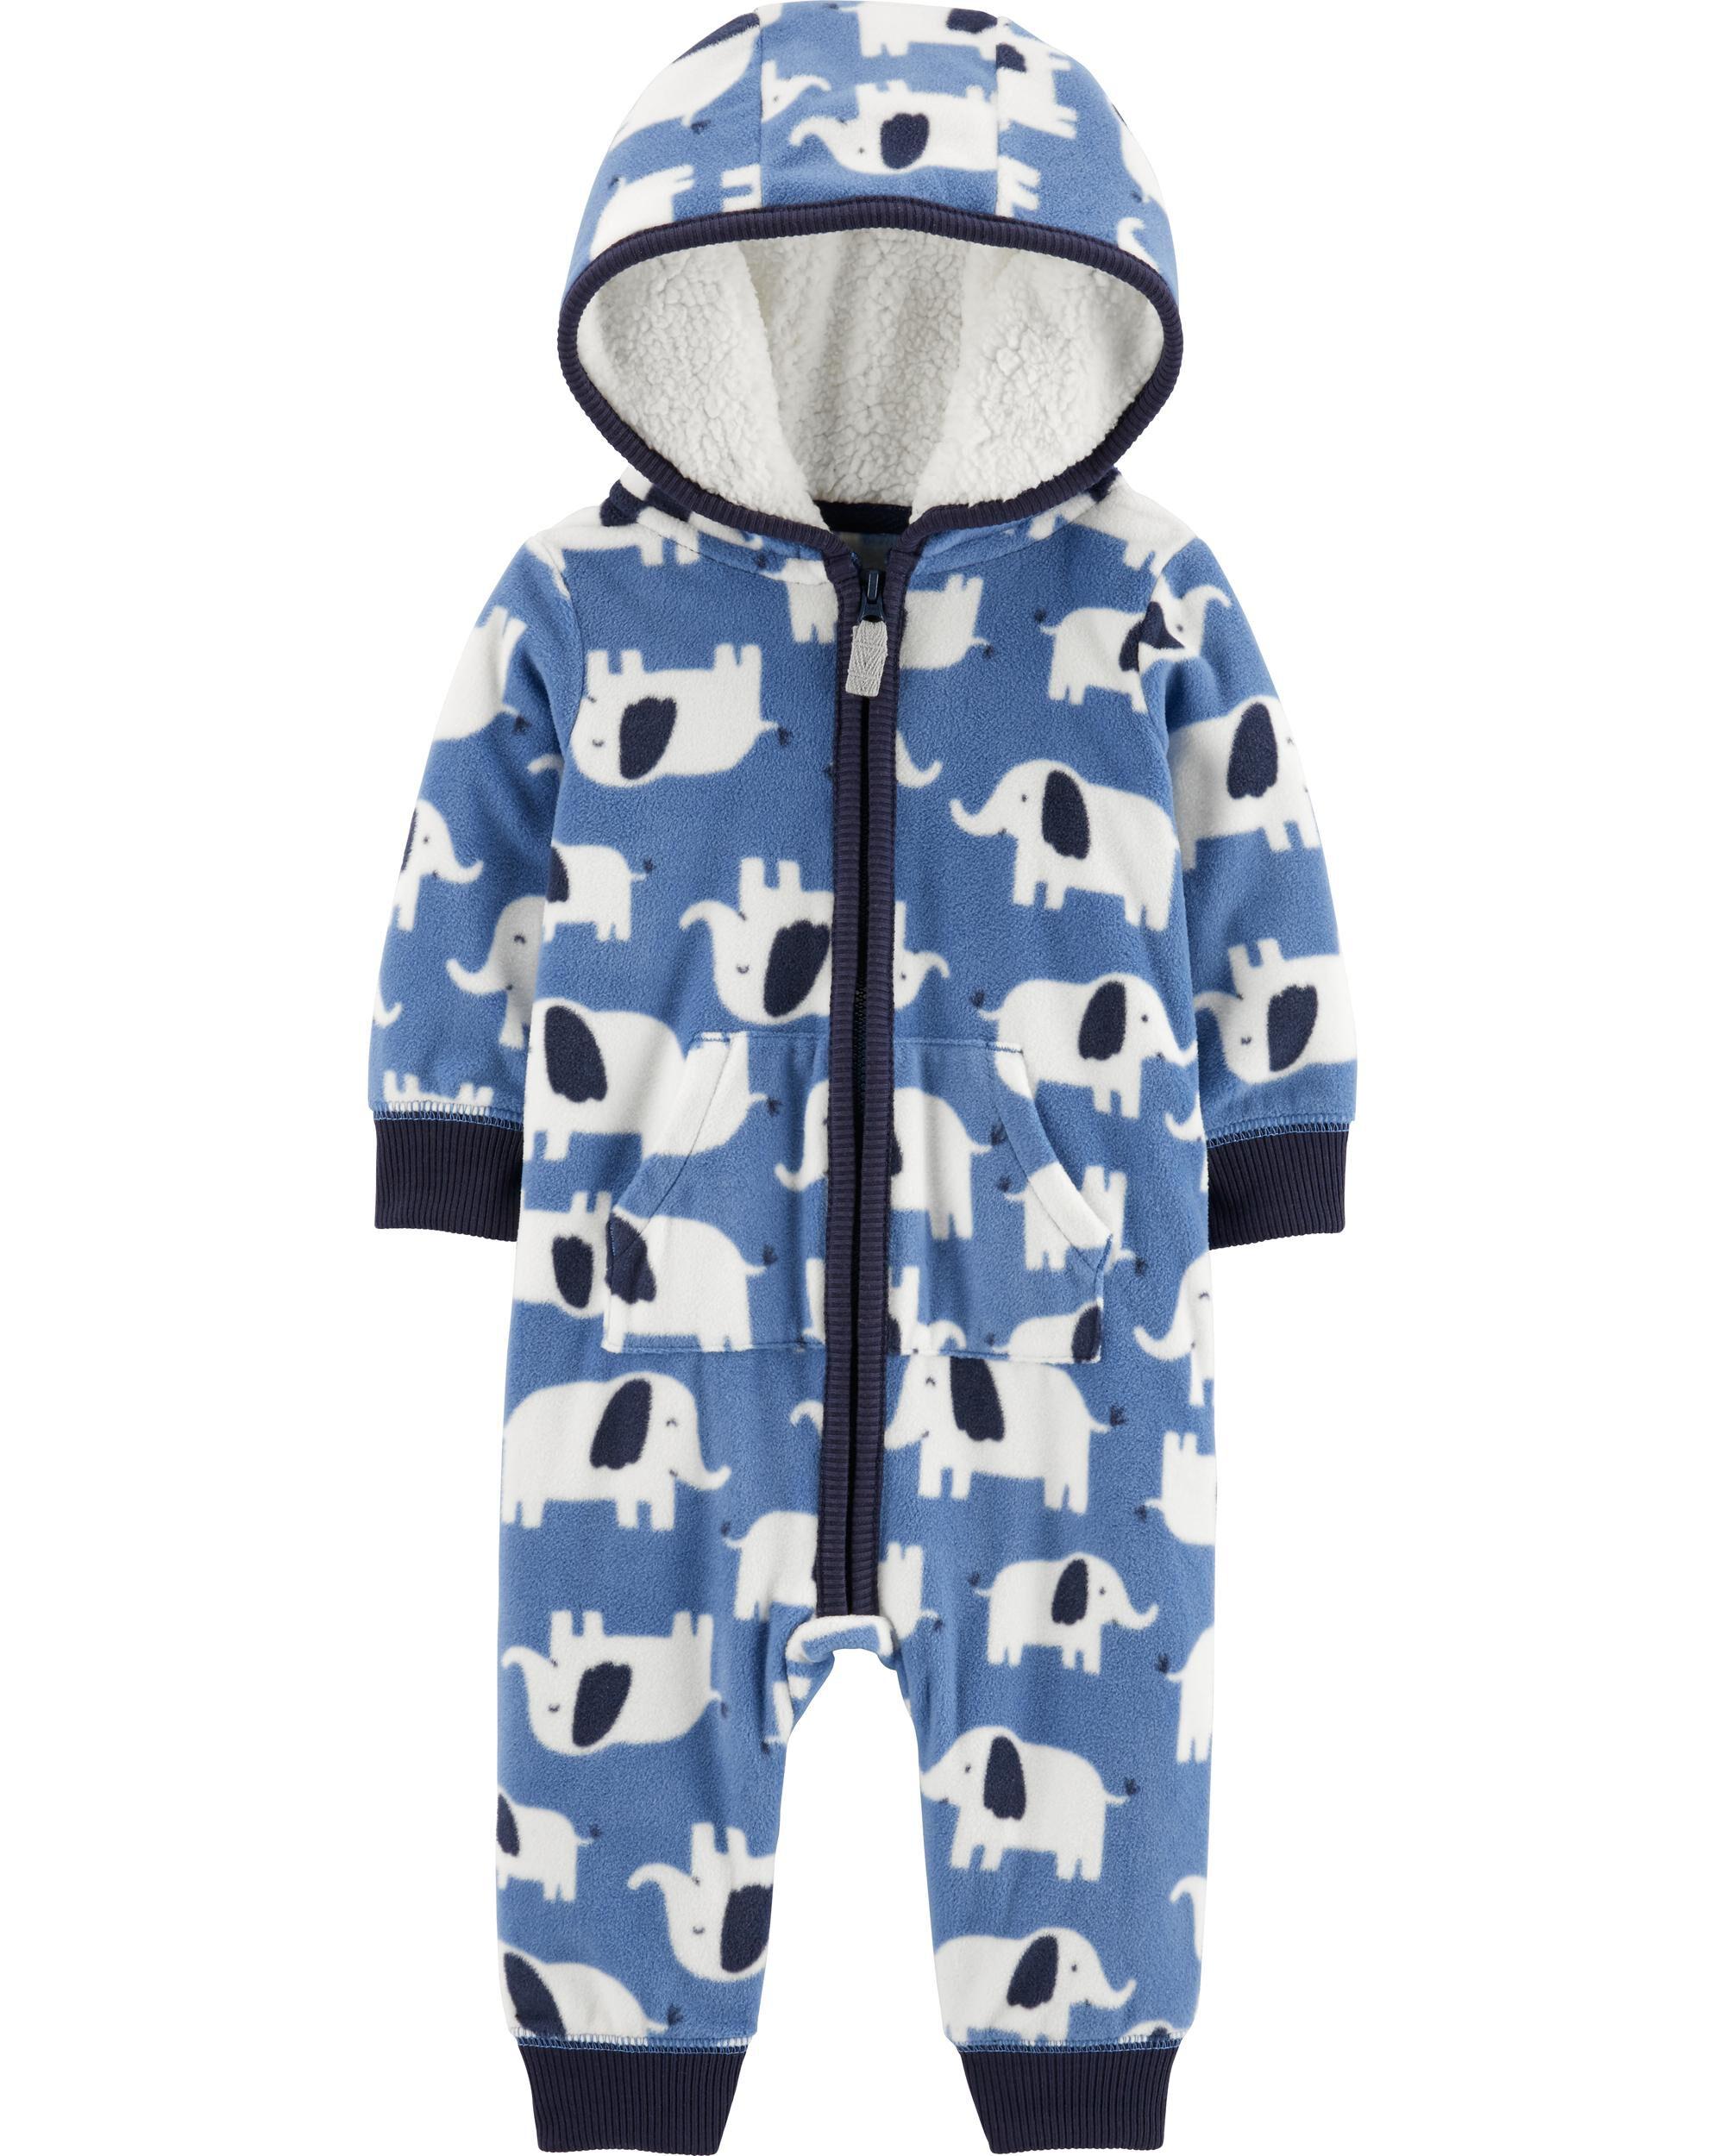 Elephant Hooded Fleece Jumpsuit